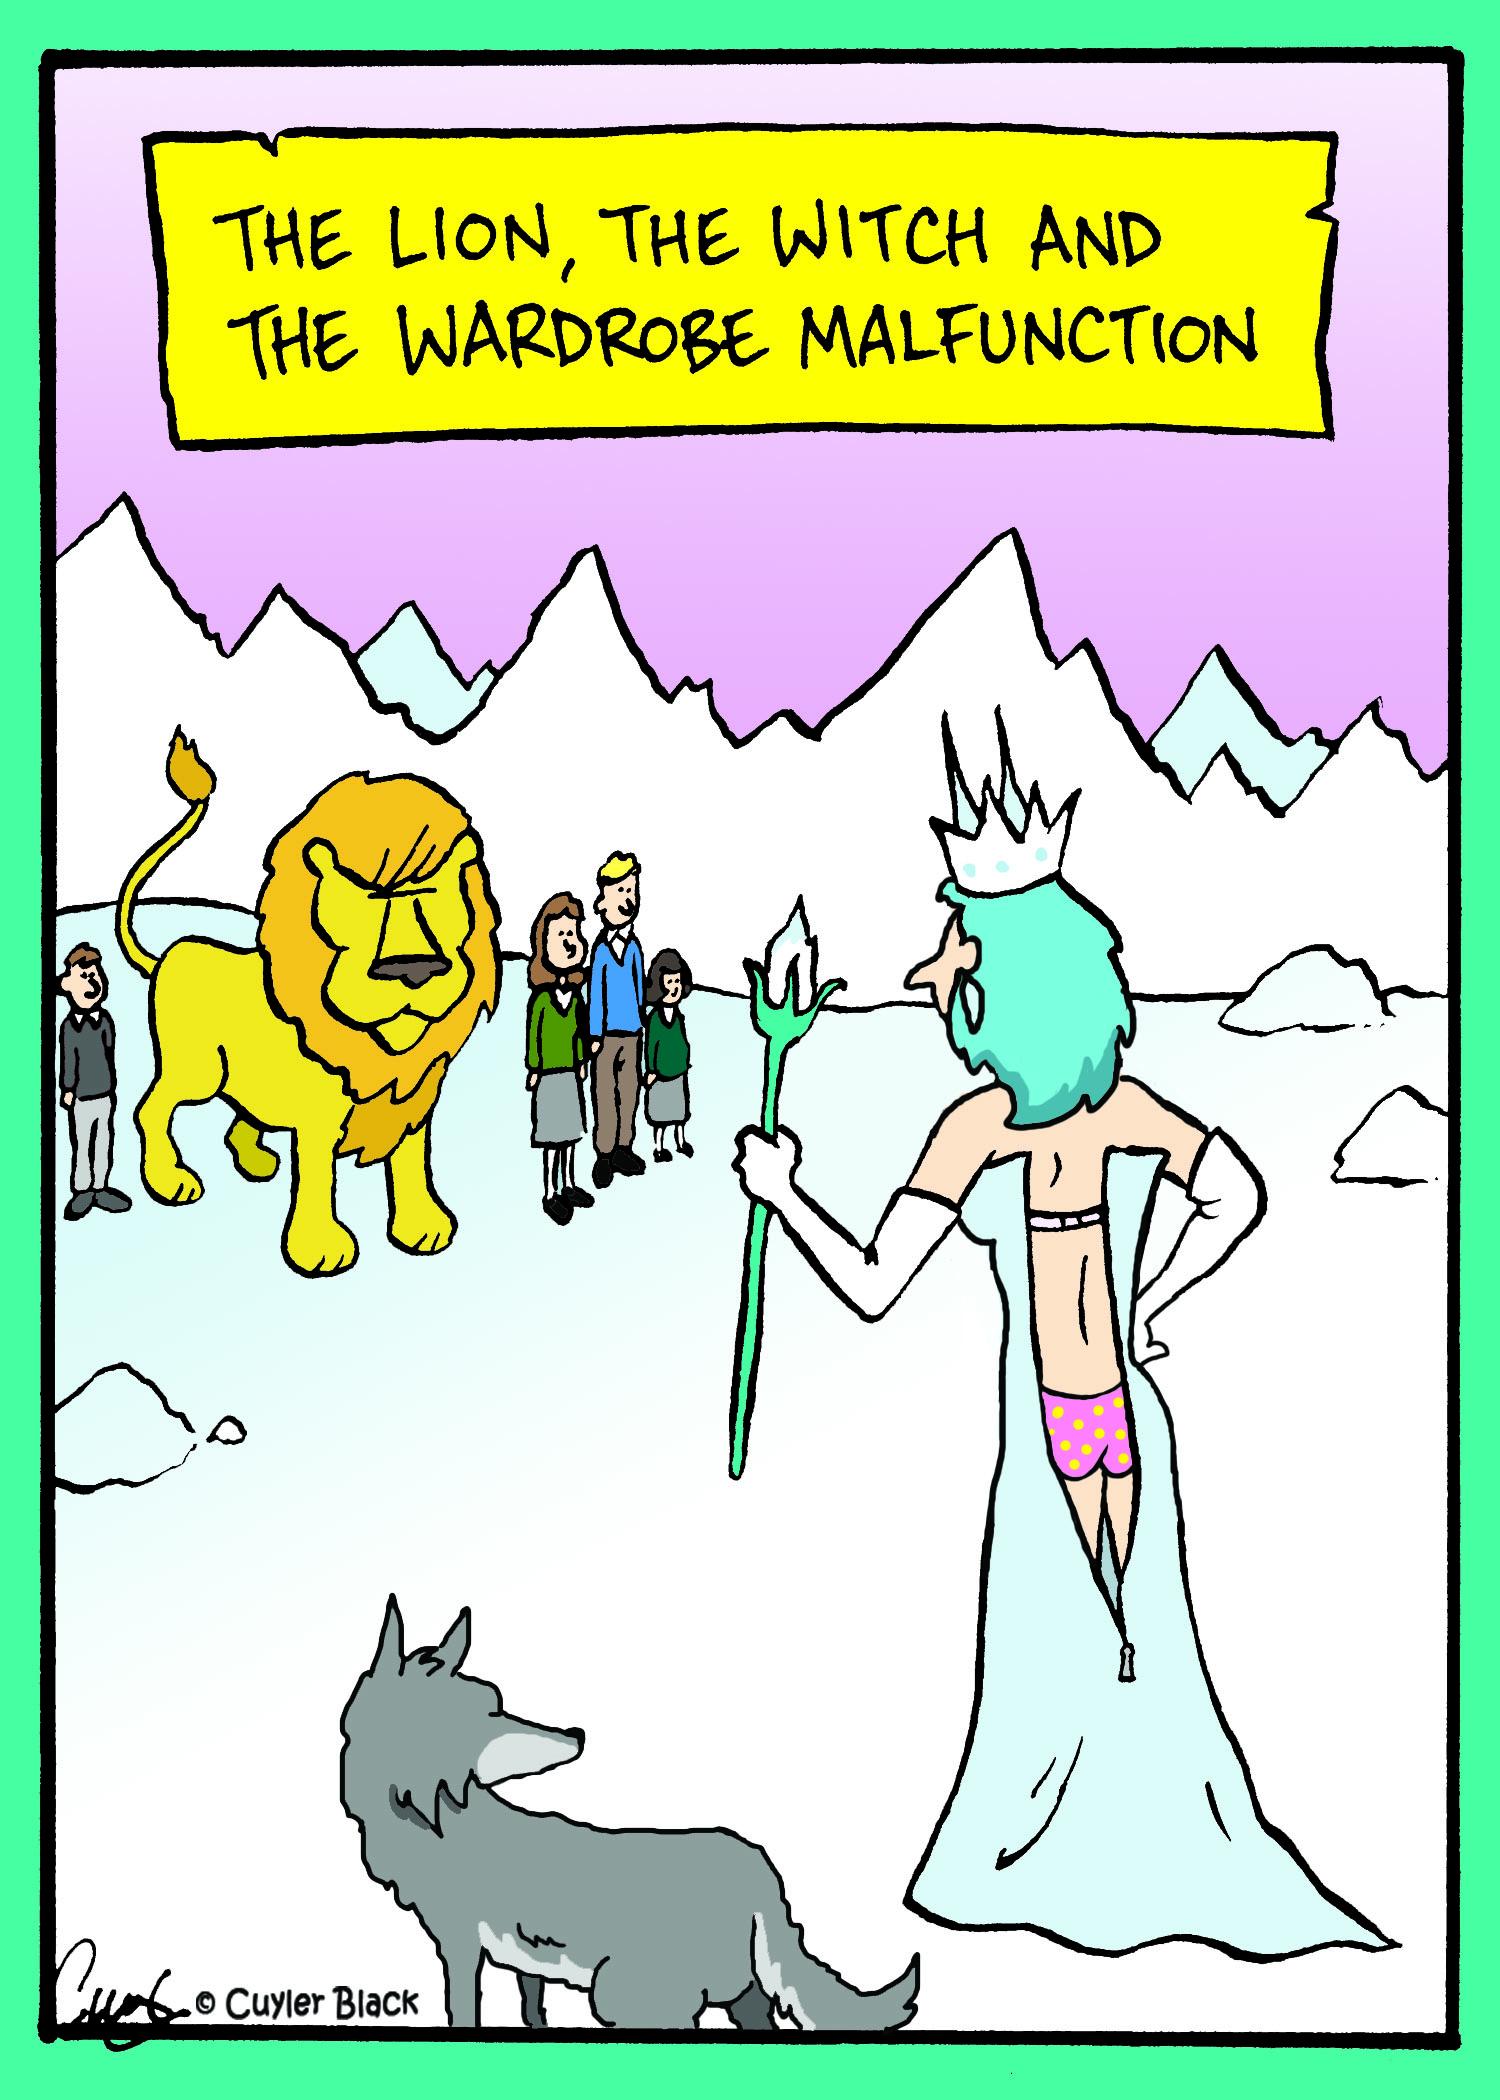 wardrobe malfunction.jpg